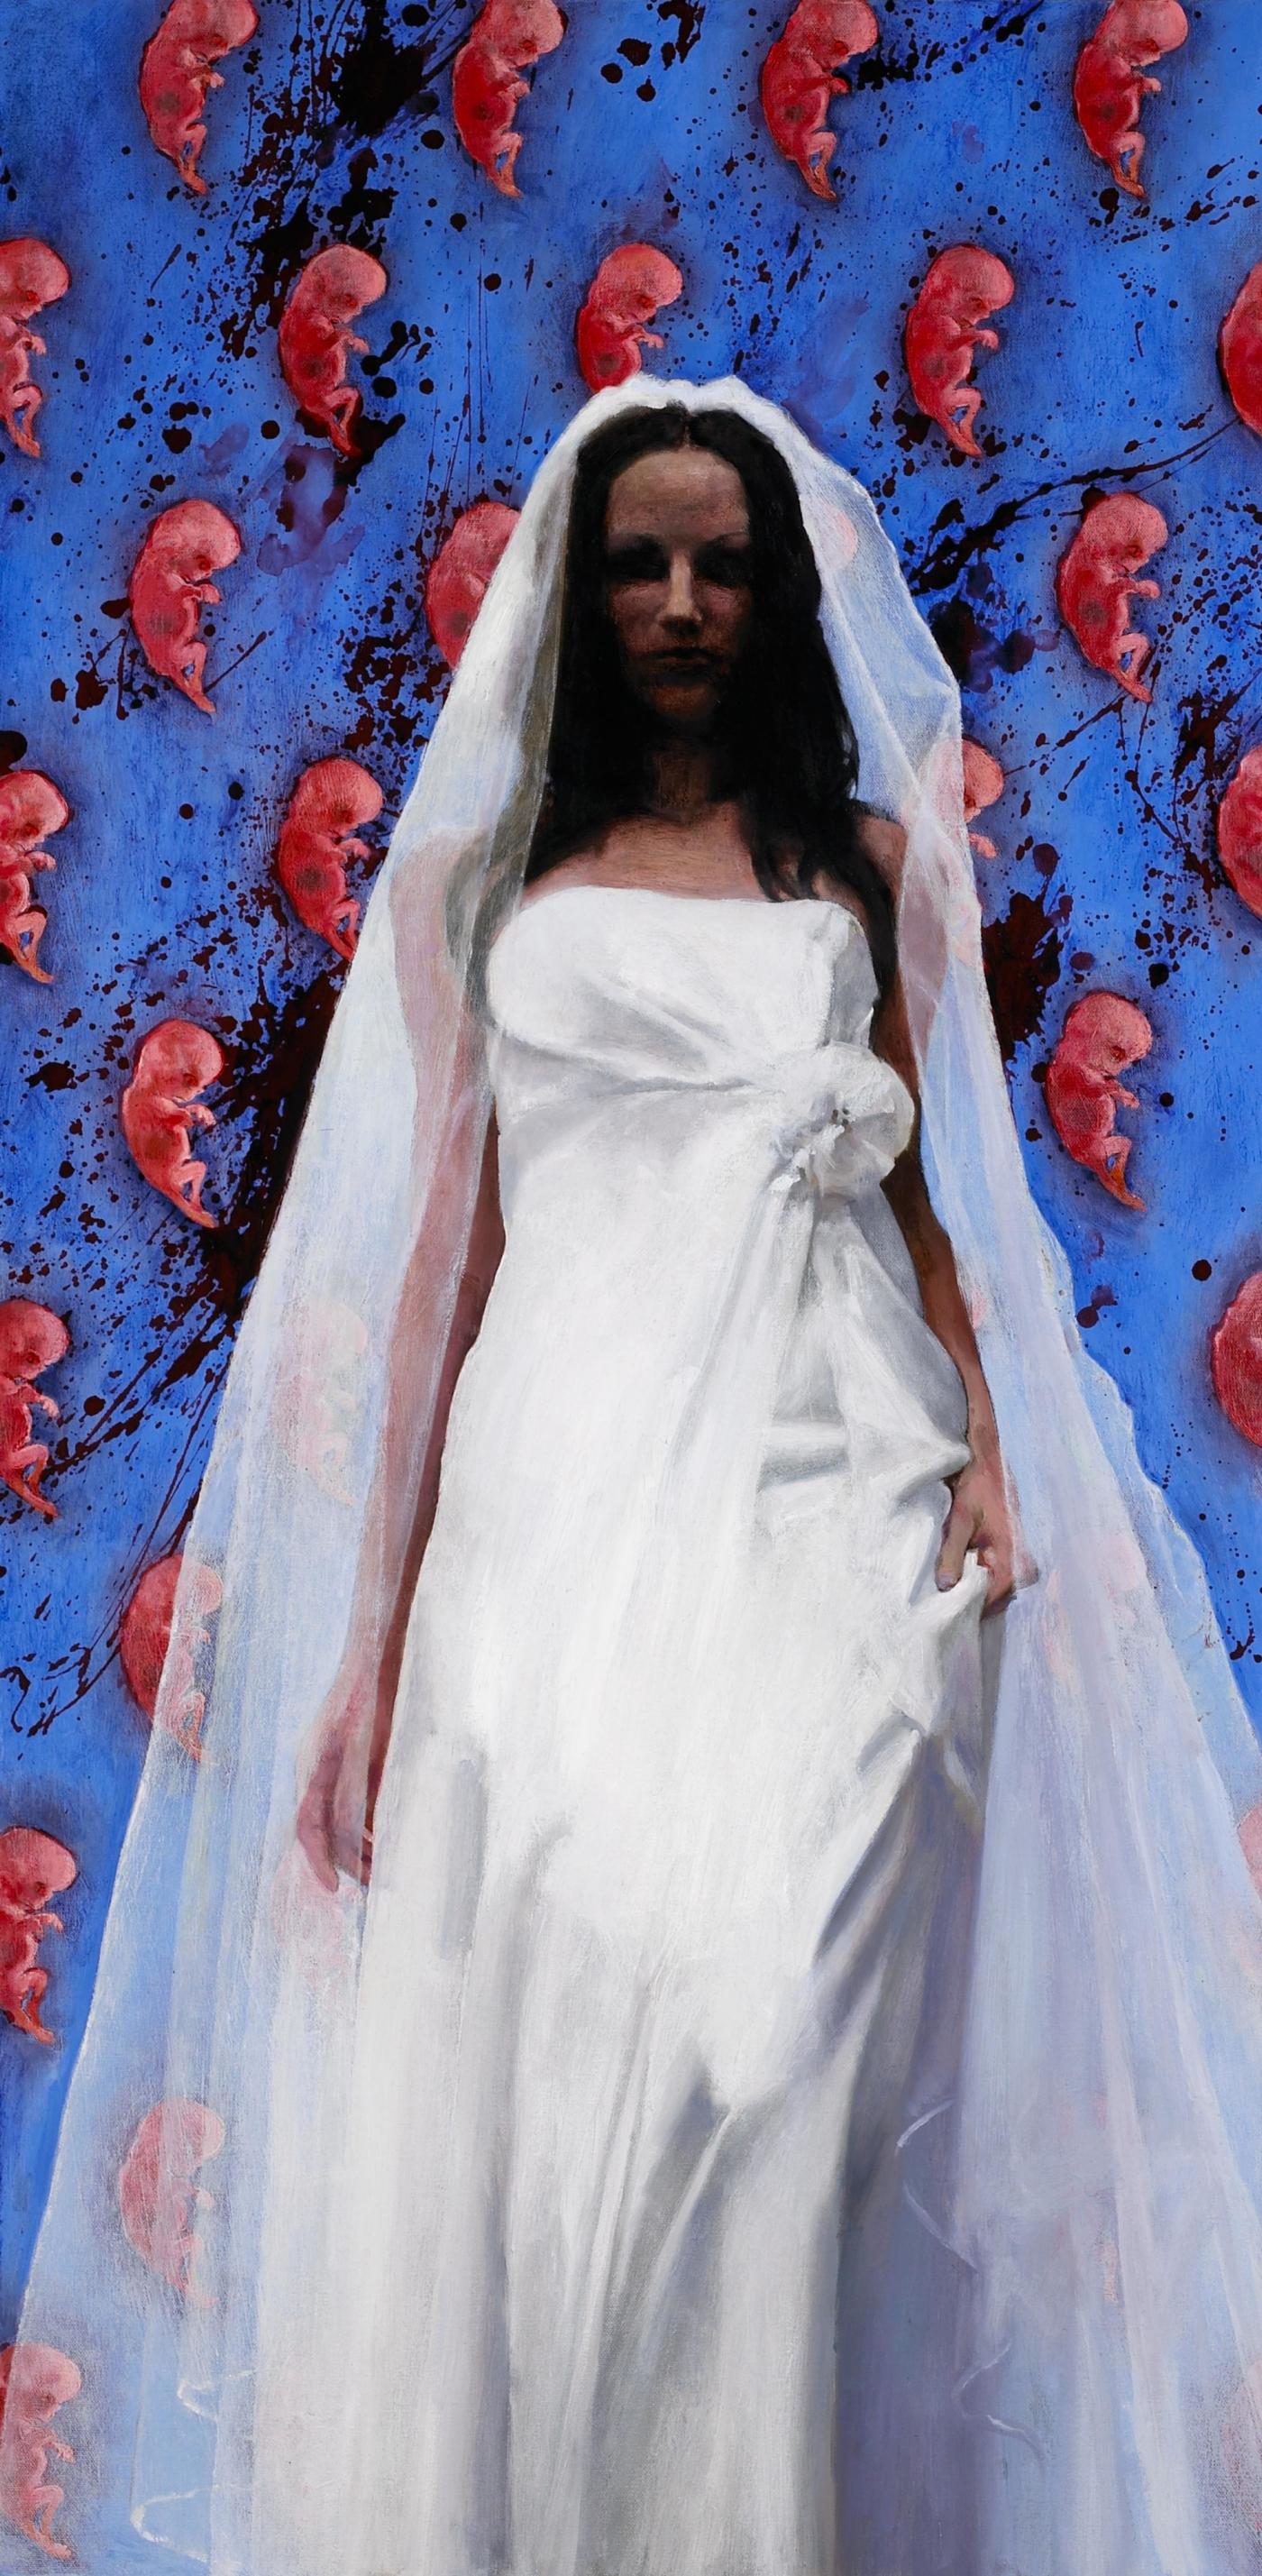 Fatherless Bride 5